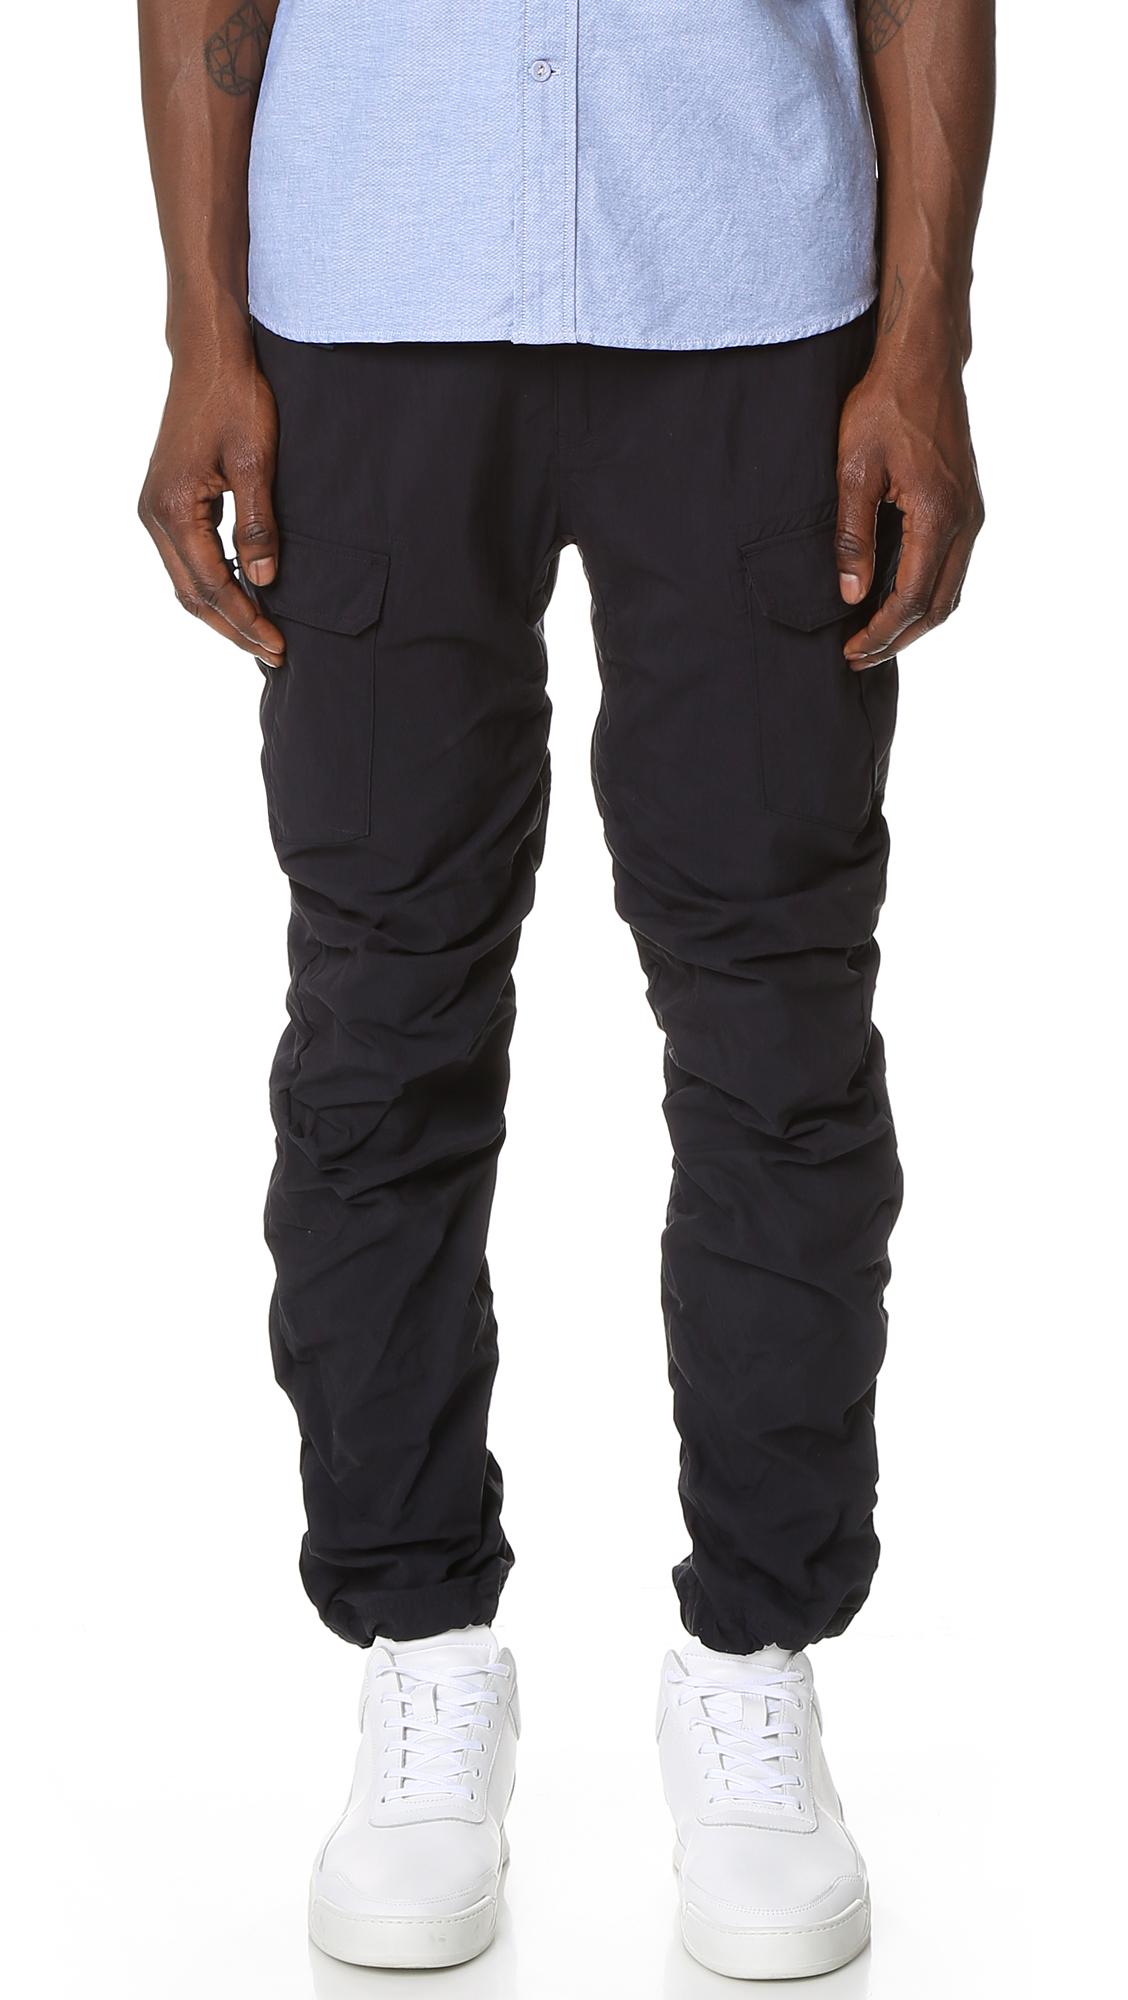 Cotton Nylon Cargo Pants 120